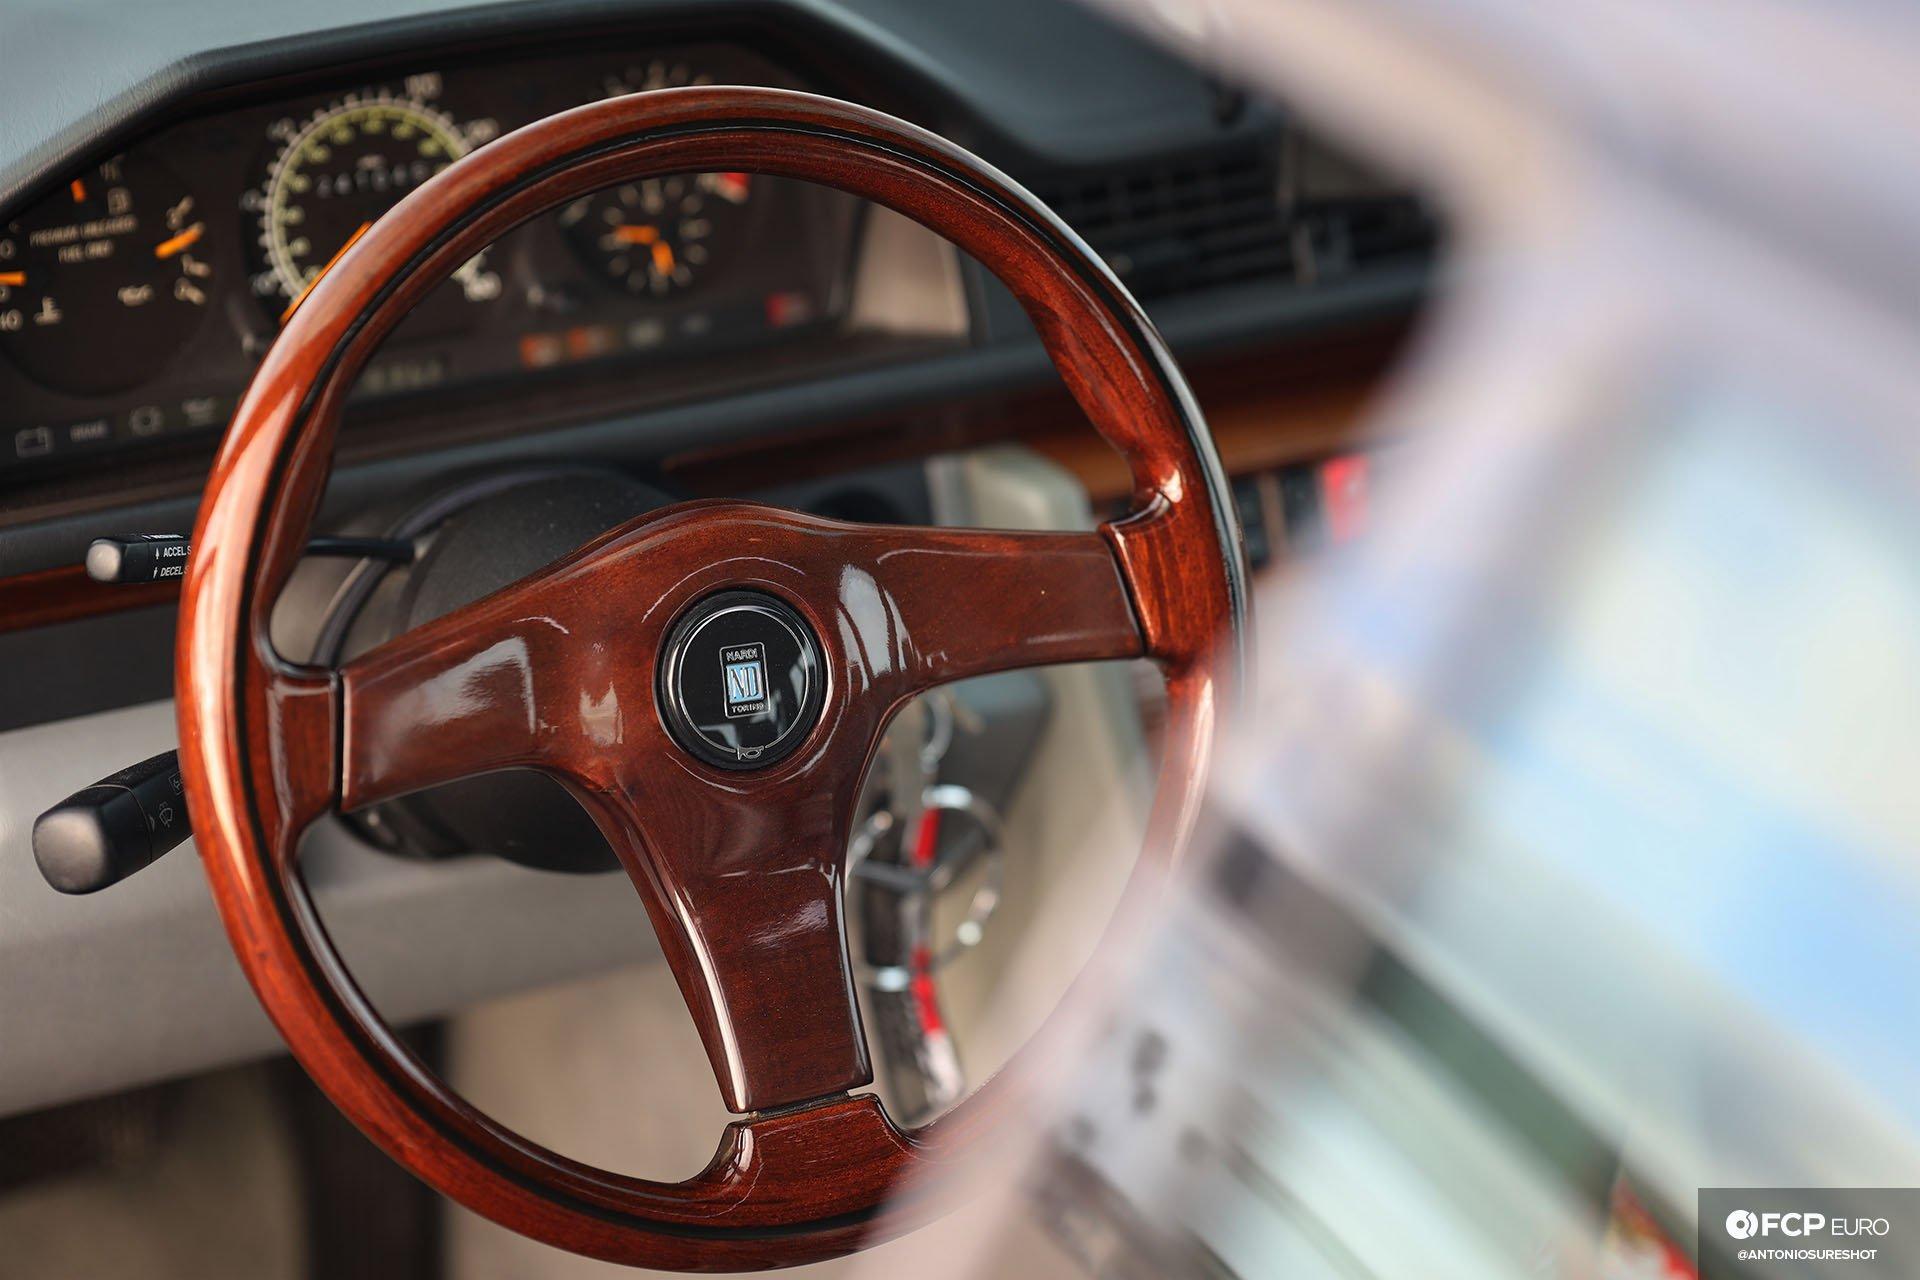 S124 Mercedes Benz E320 wagon Nardi Gara 3